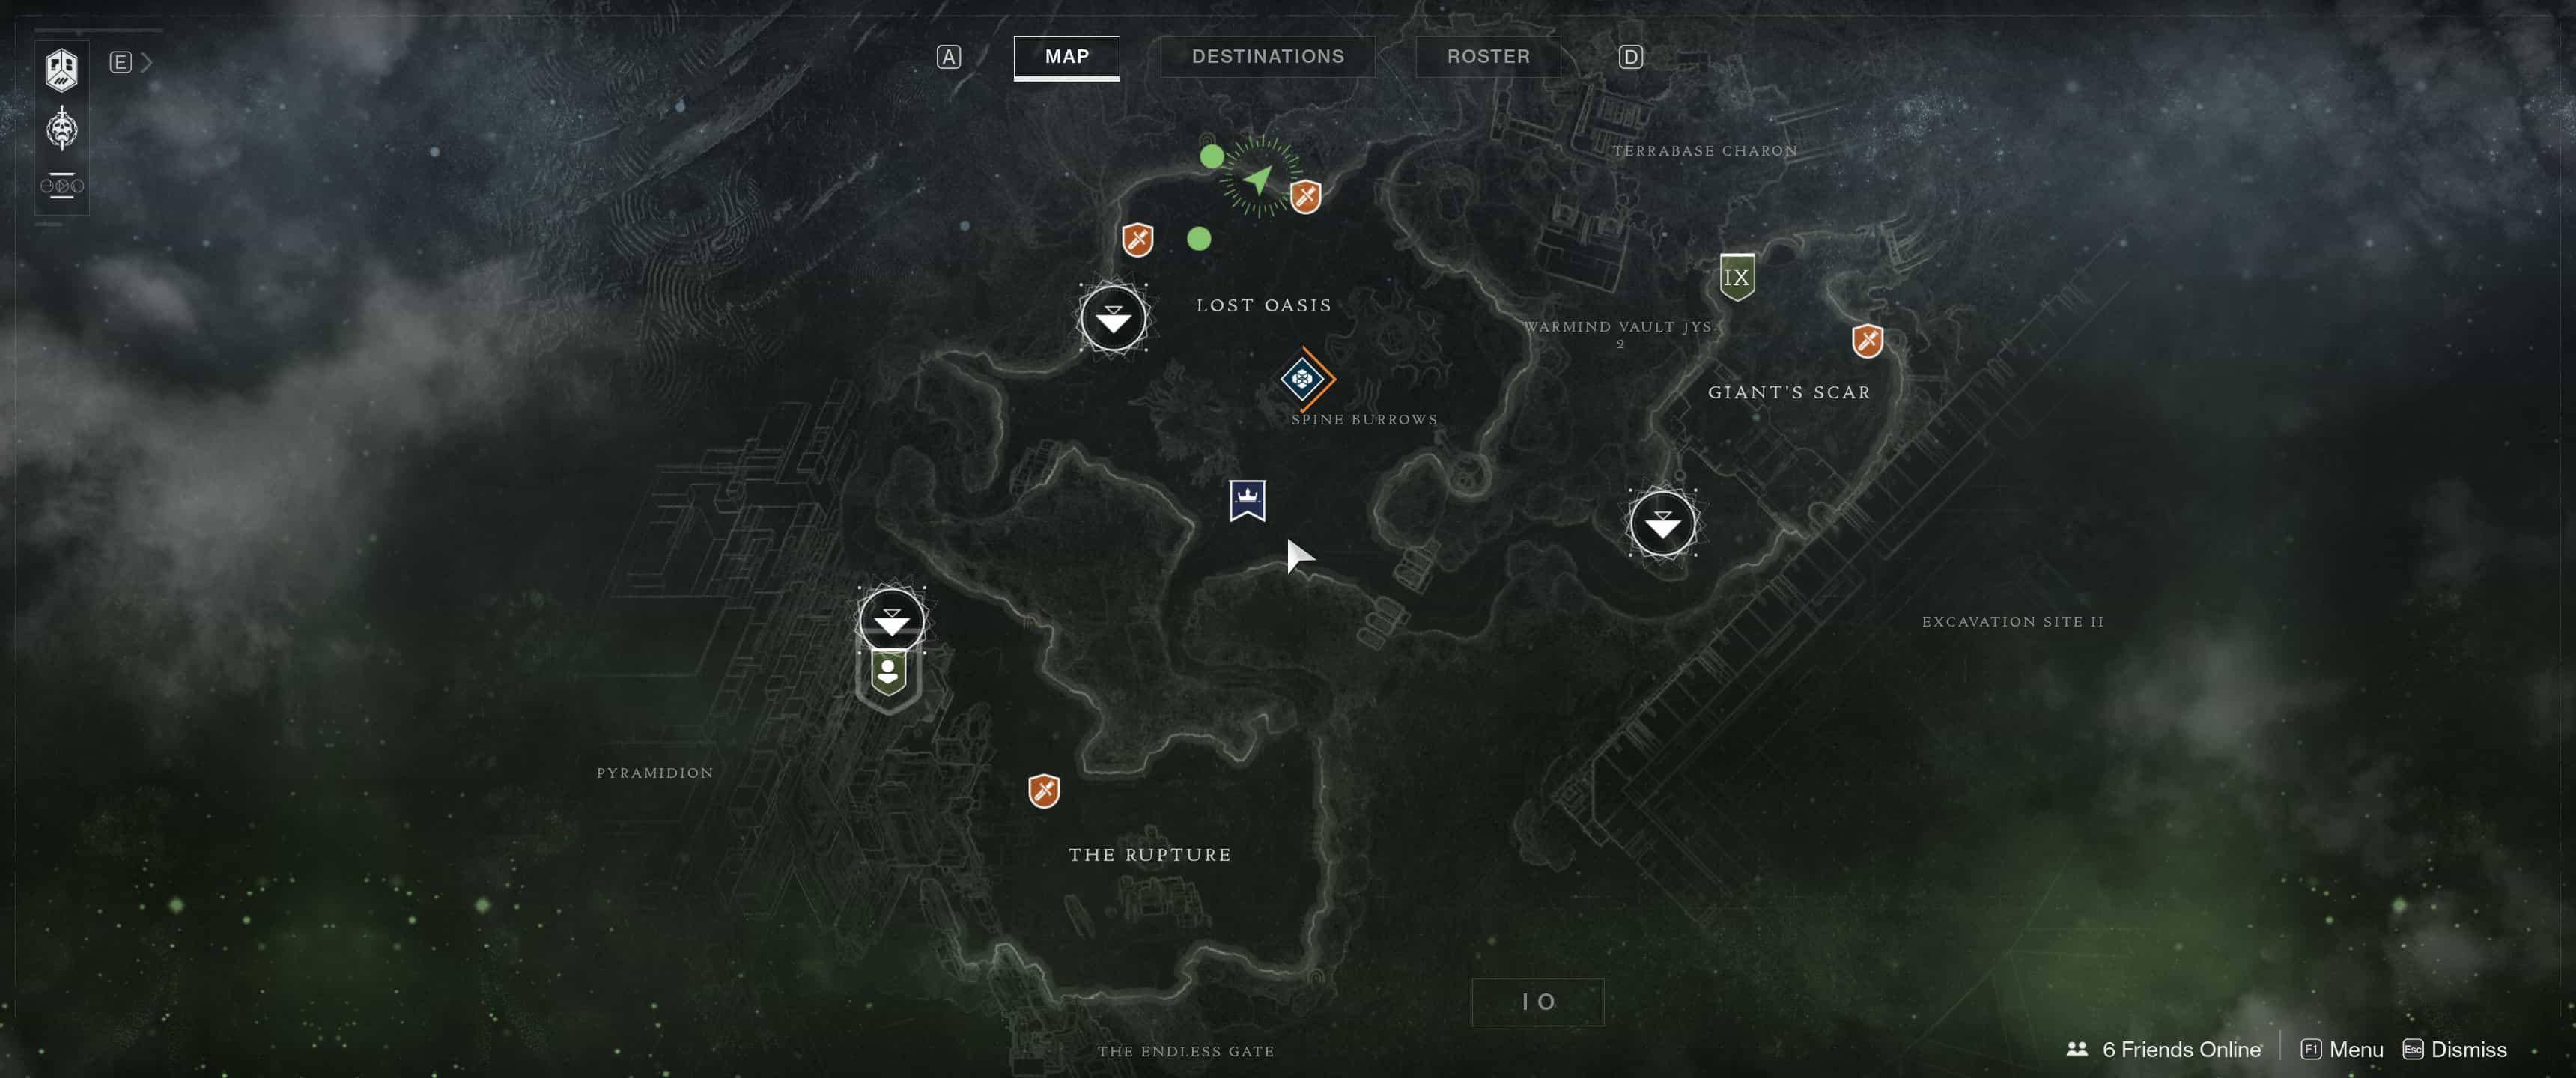 destiny 2 how to use fireteam finder